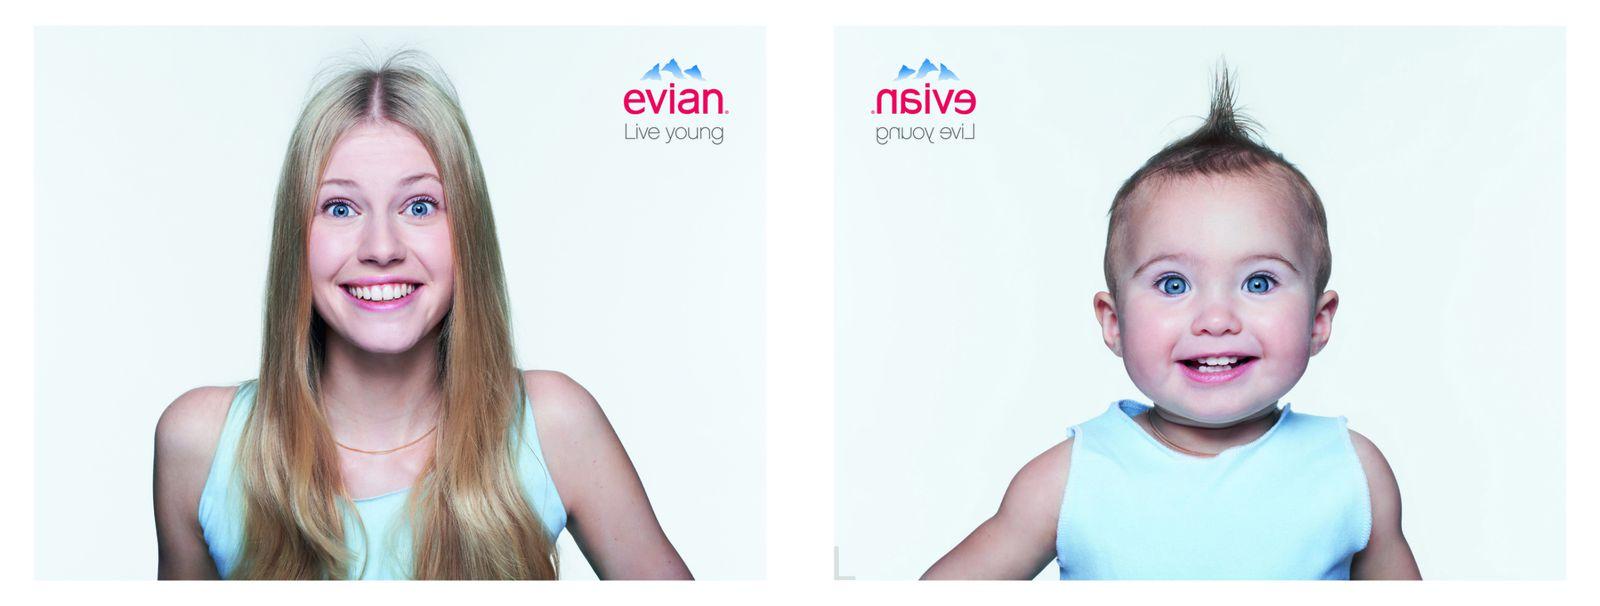 EVIAN - Baby &amp&#x3B; Me !